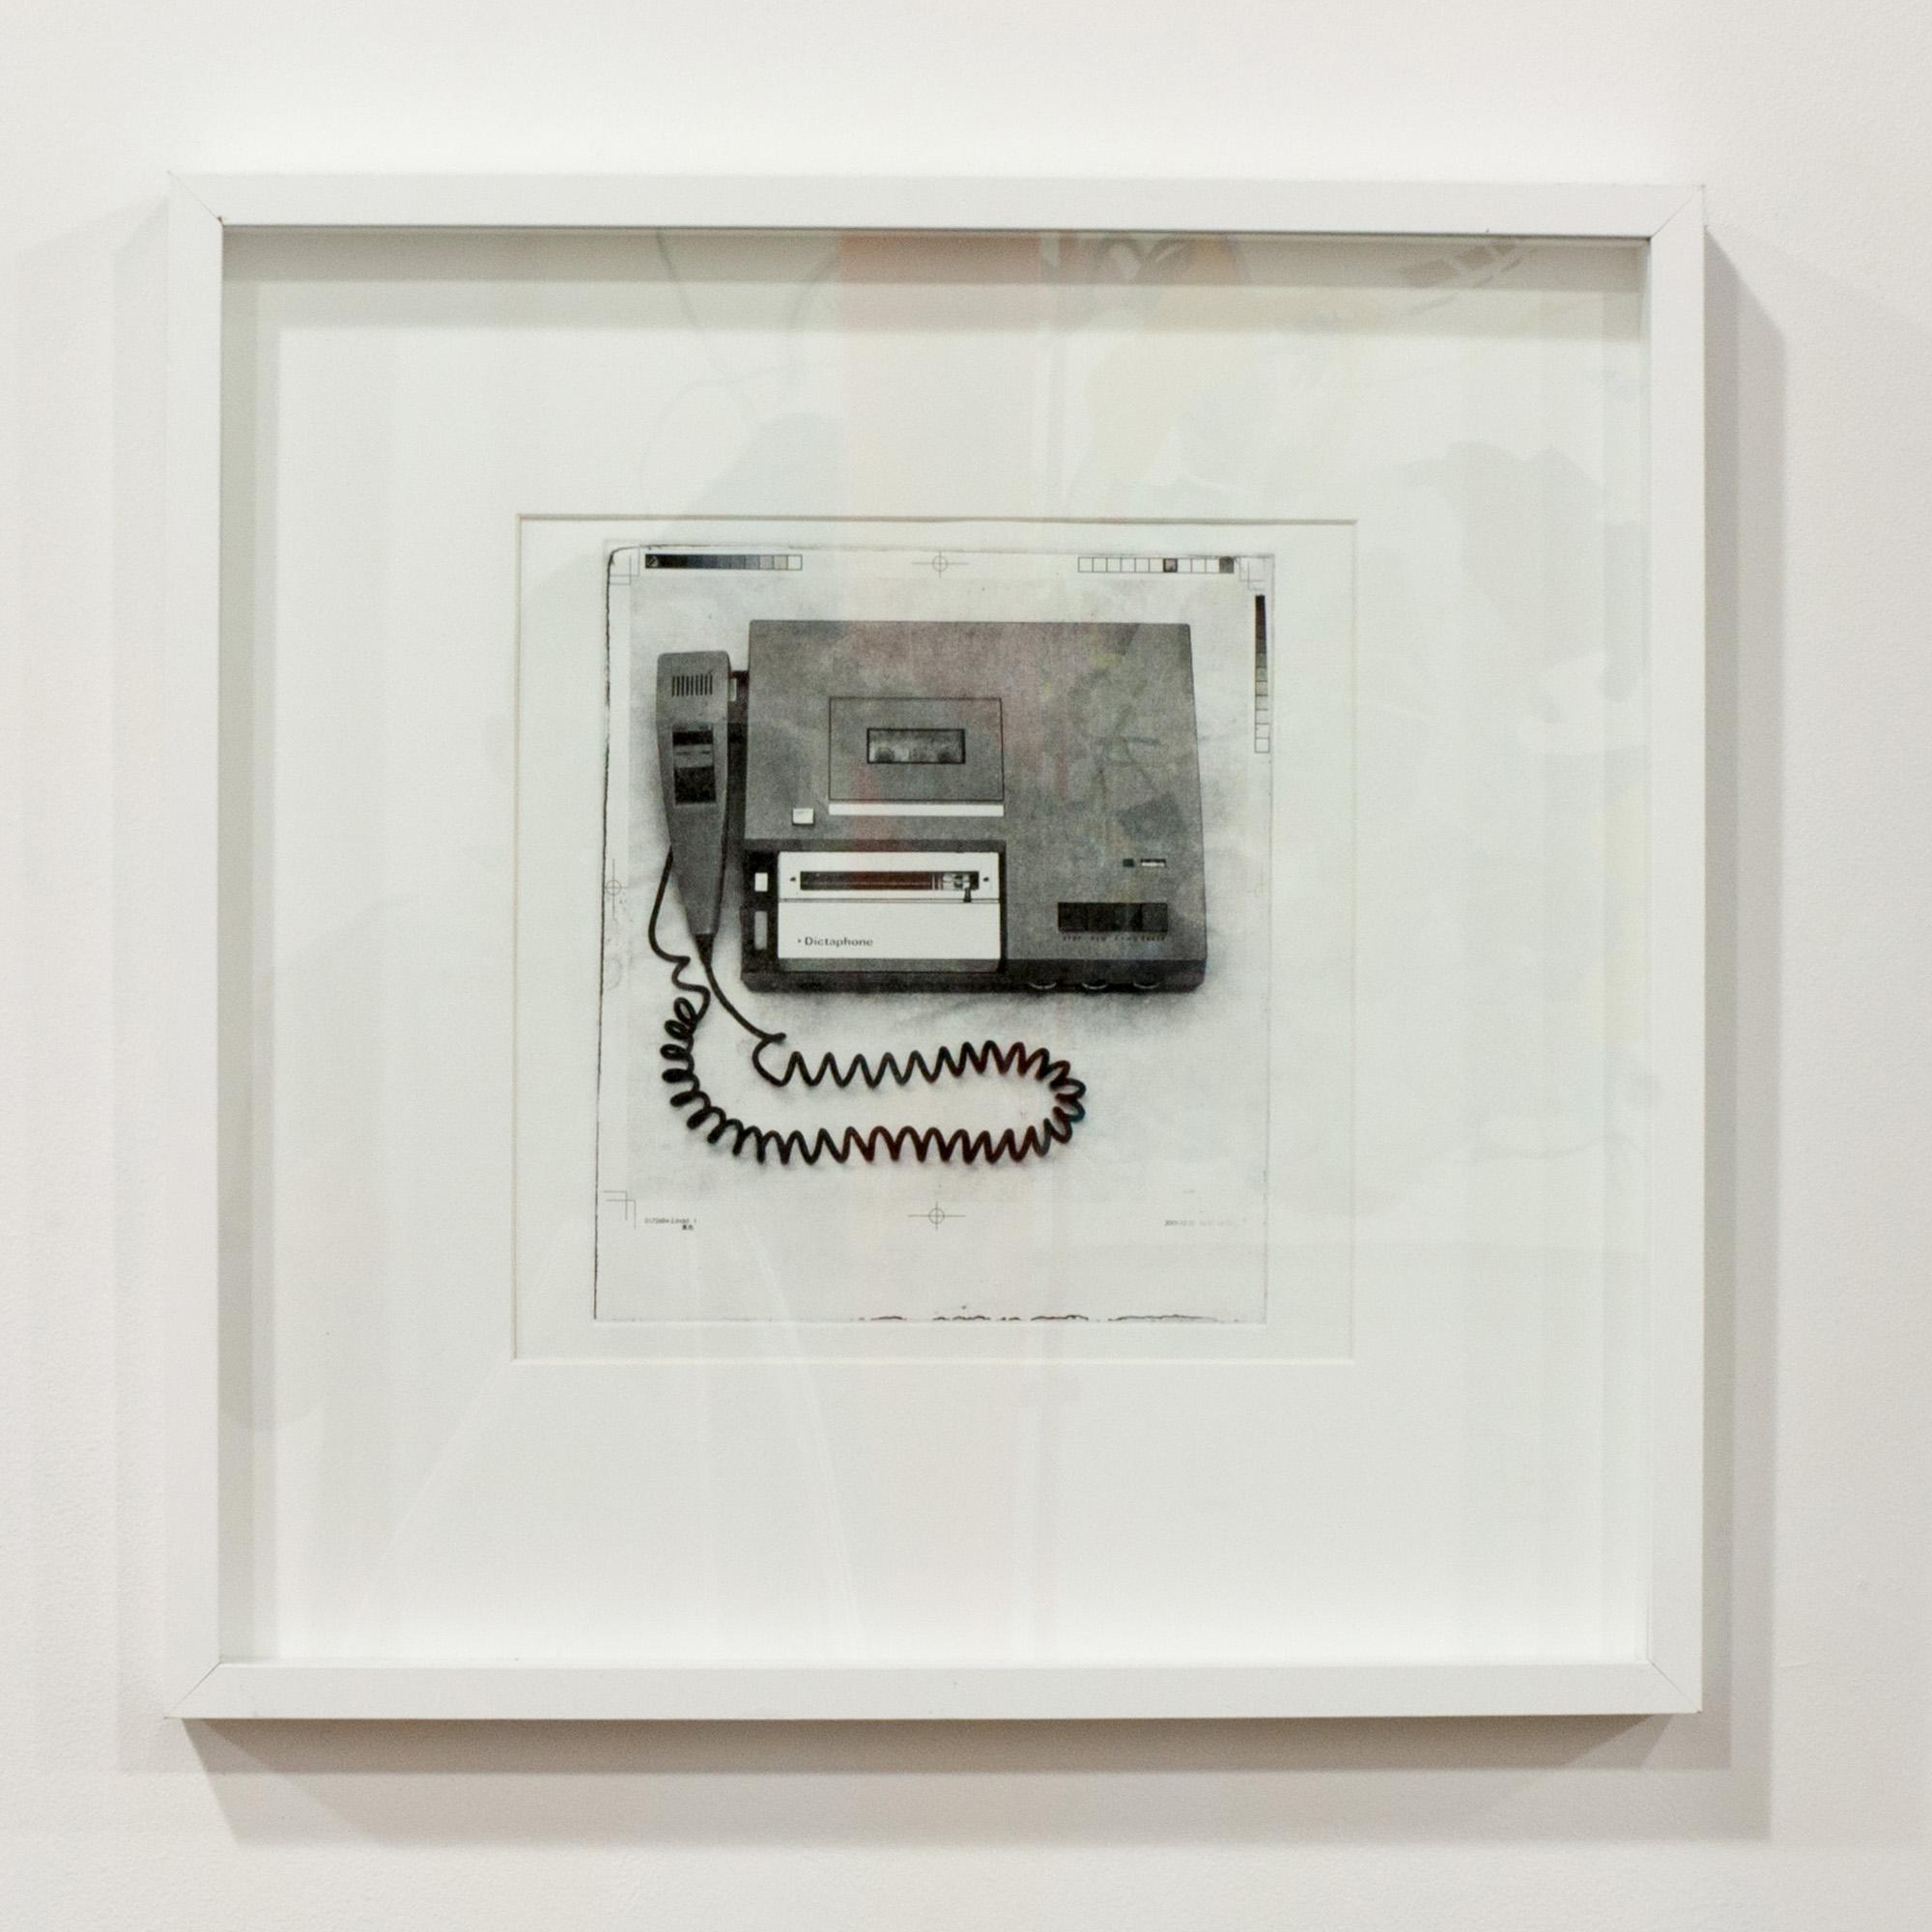 1979 (Dictaphone) photogravure 12 x 12 inches JKO 092G